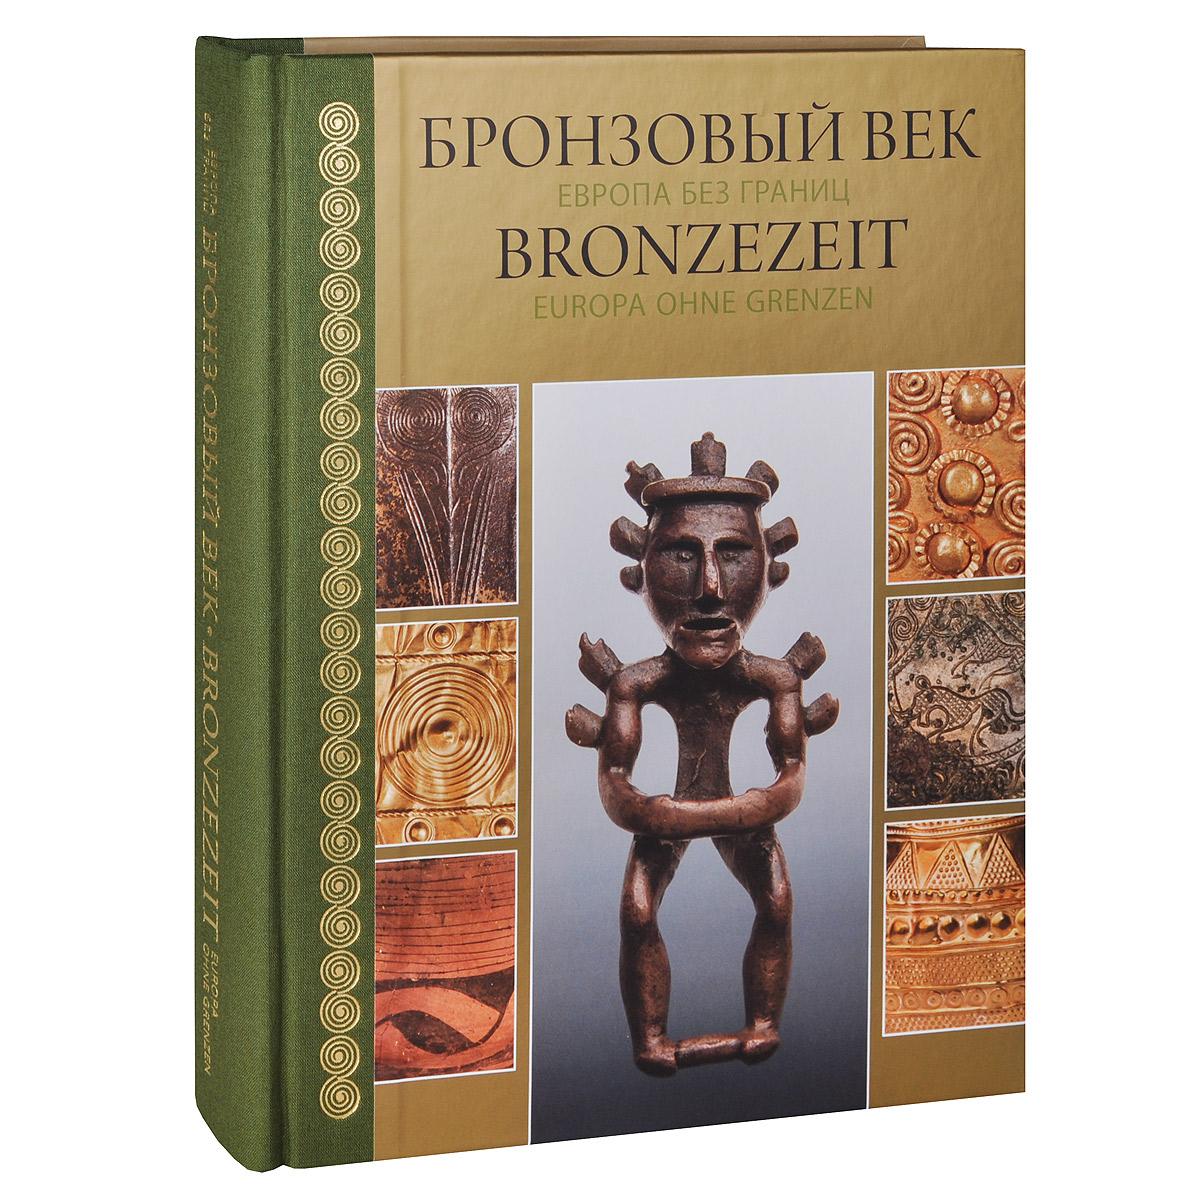 Бронзовый век. Европа без границ / Bronzezeit: Europa ohne Grenzen